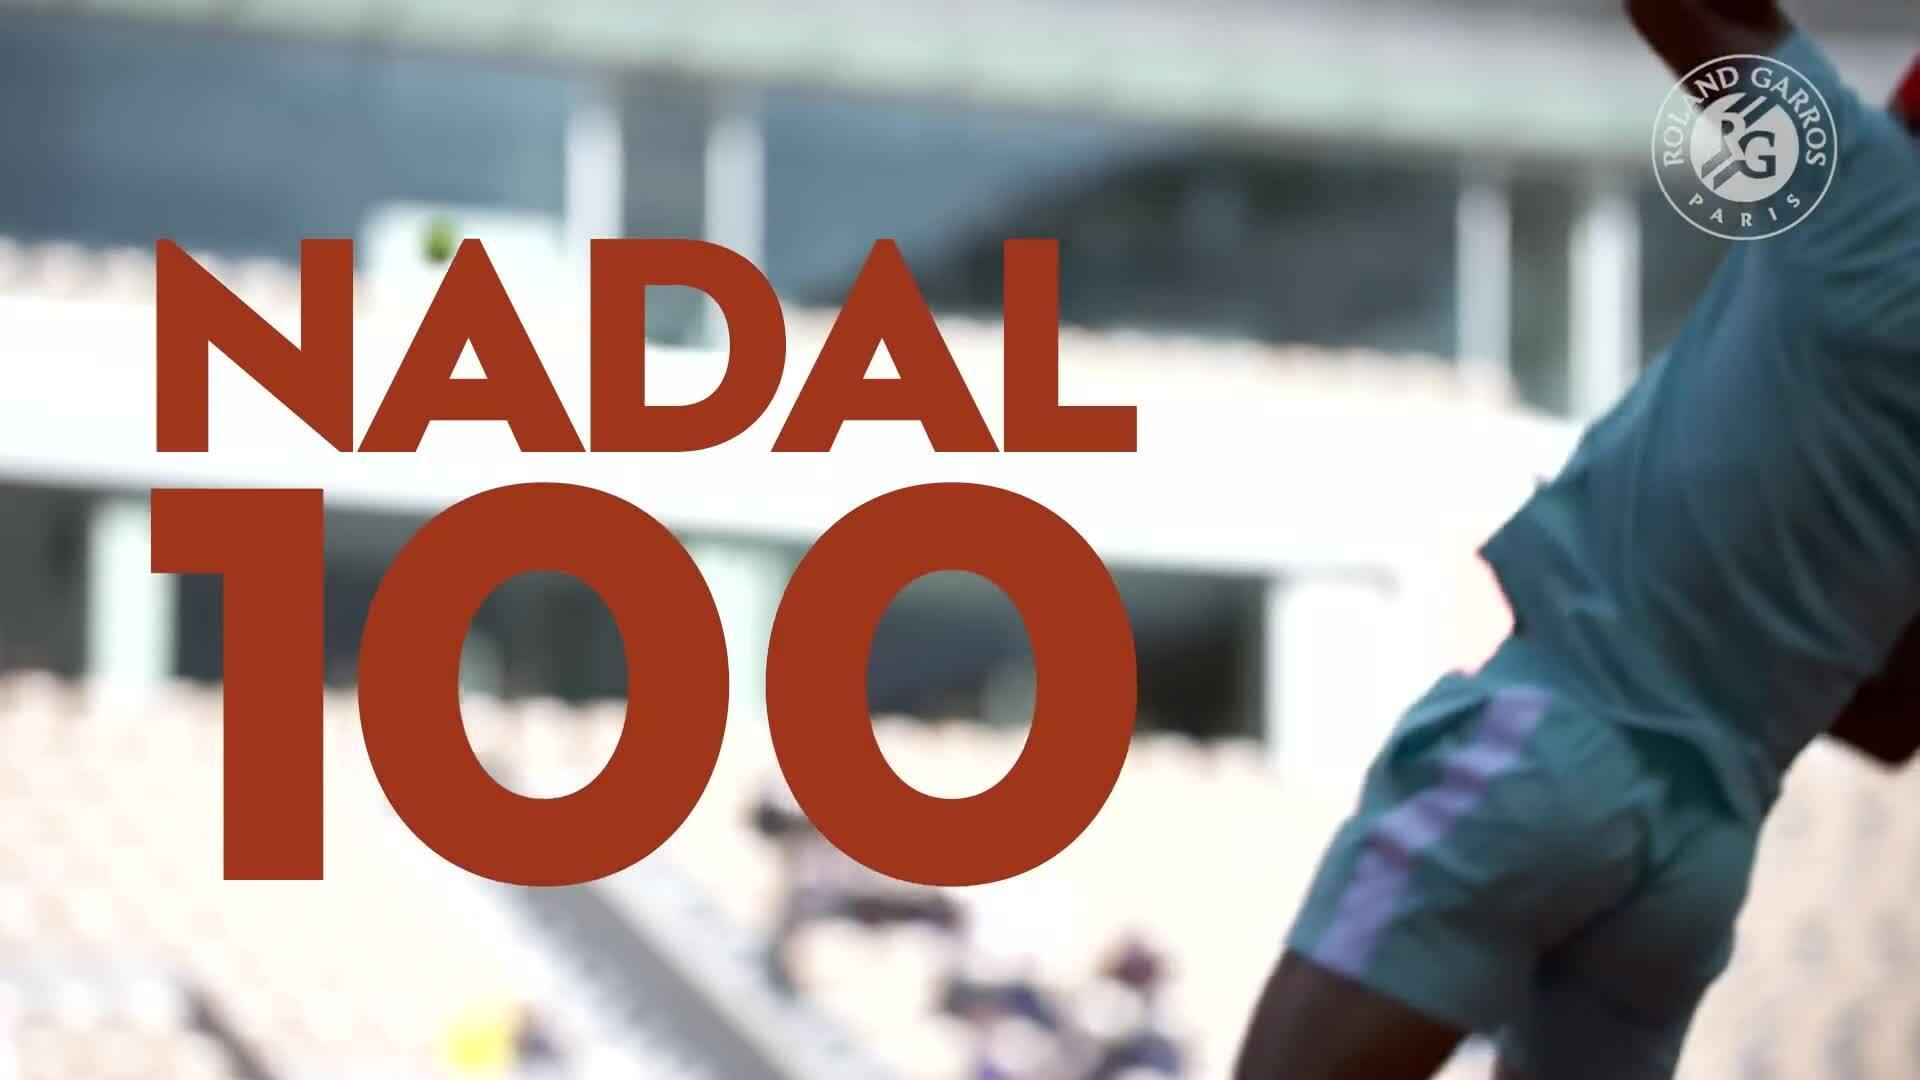 Chiến thắng thứ 100 của Rafael Nadal tại Roland-Garros